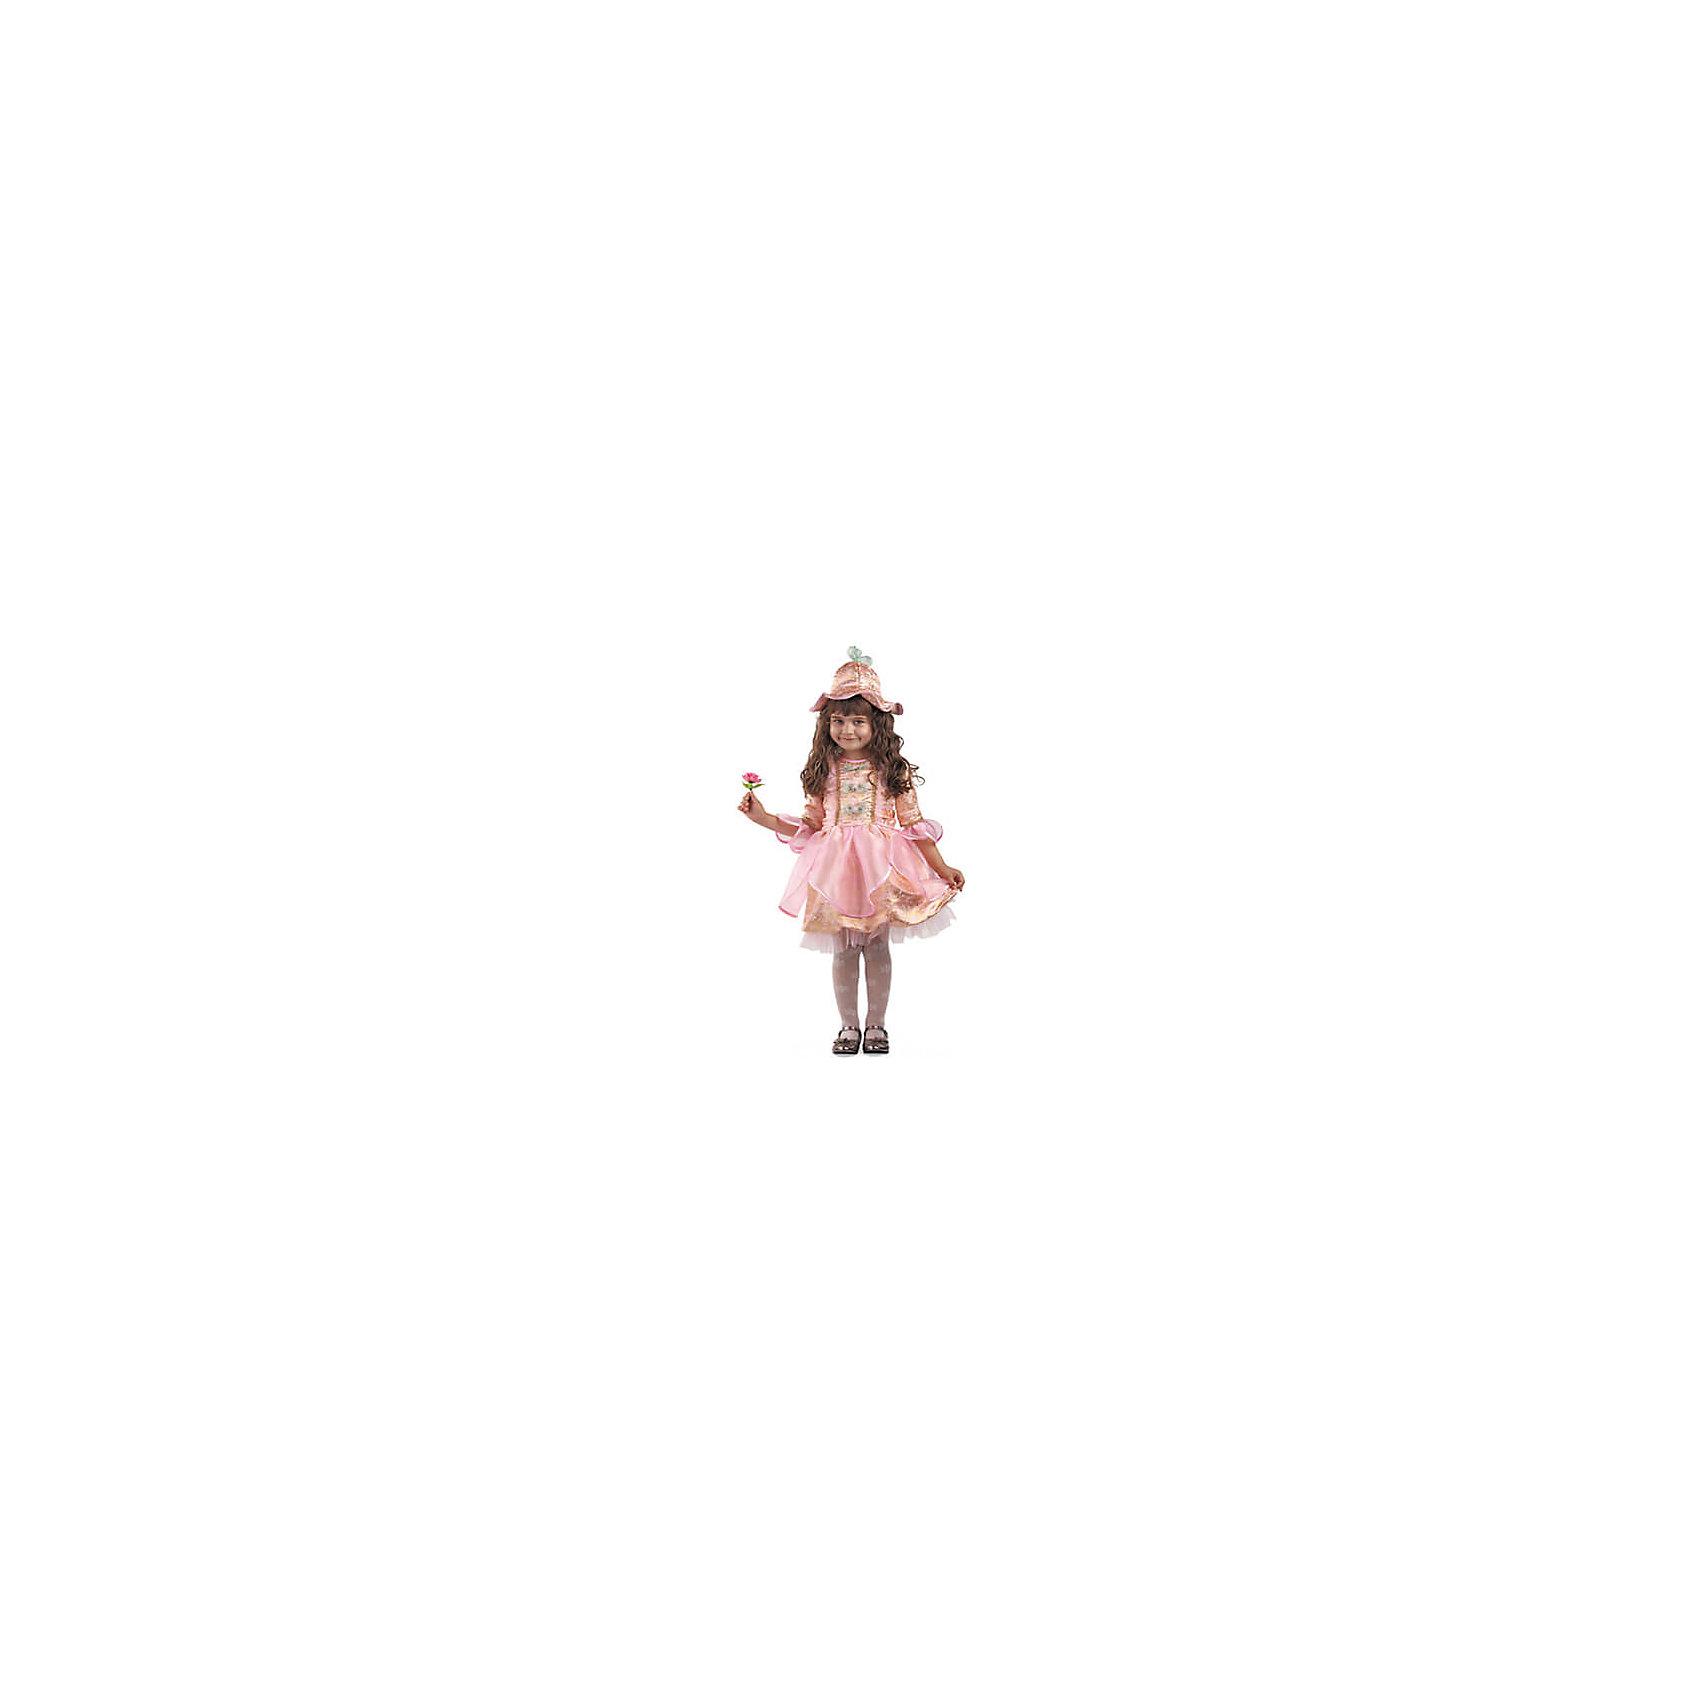 Батик Карнавальный костюм Дюймовочка (Каранвал-премьер) батик карнавальный костюм фея фауна